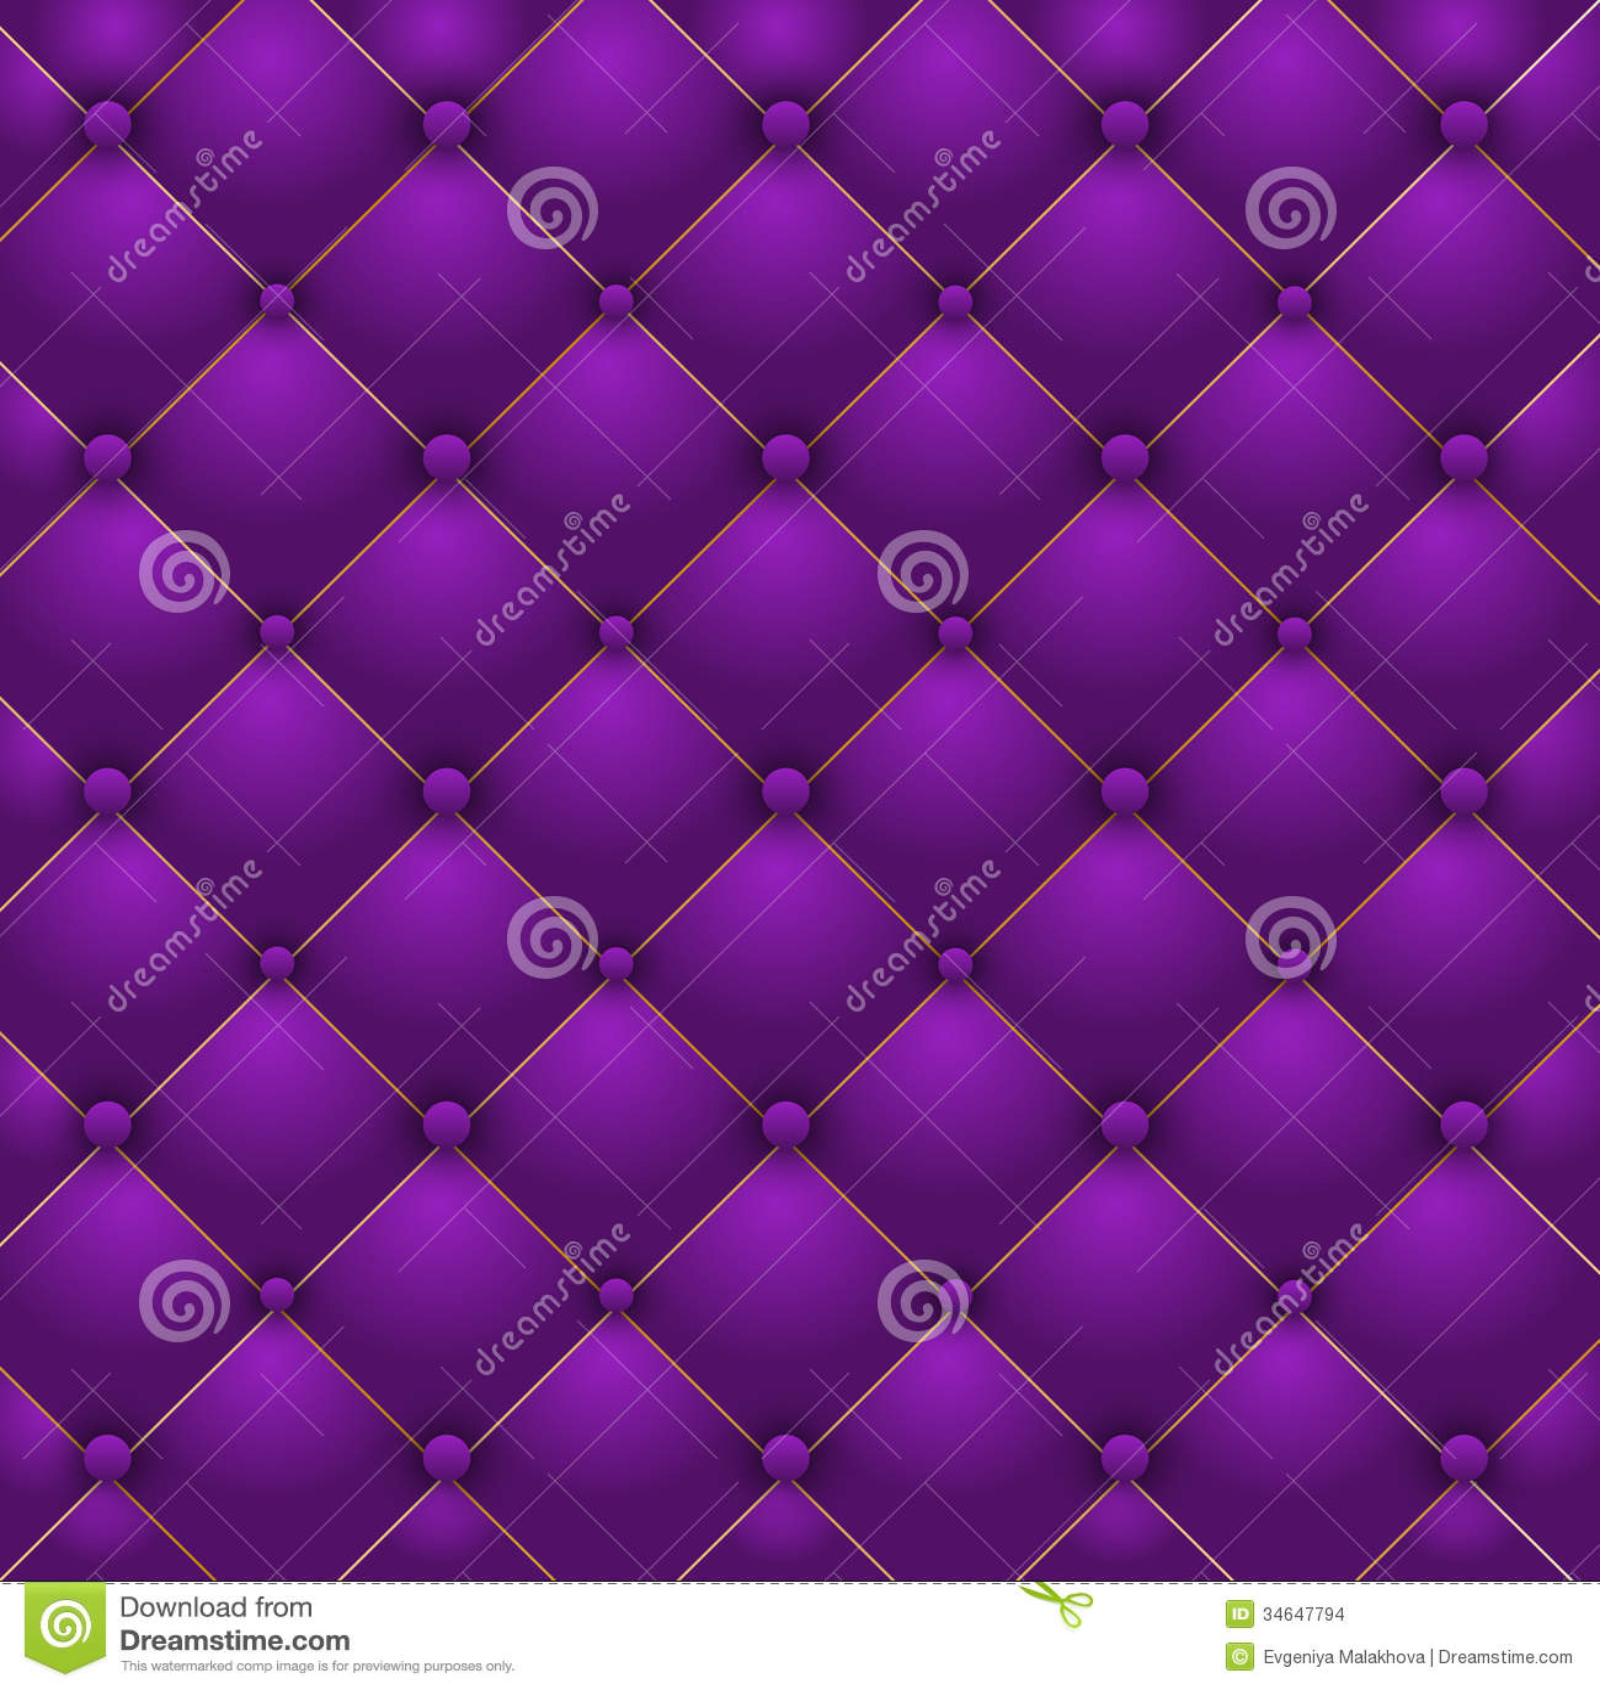 lavender background design - photo #44